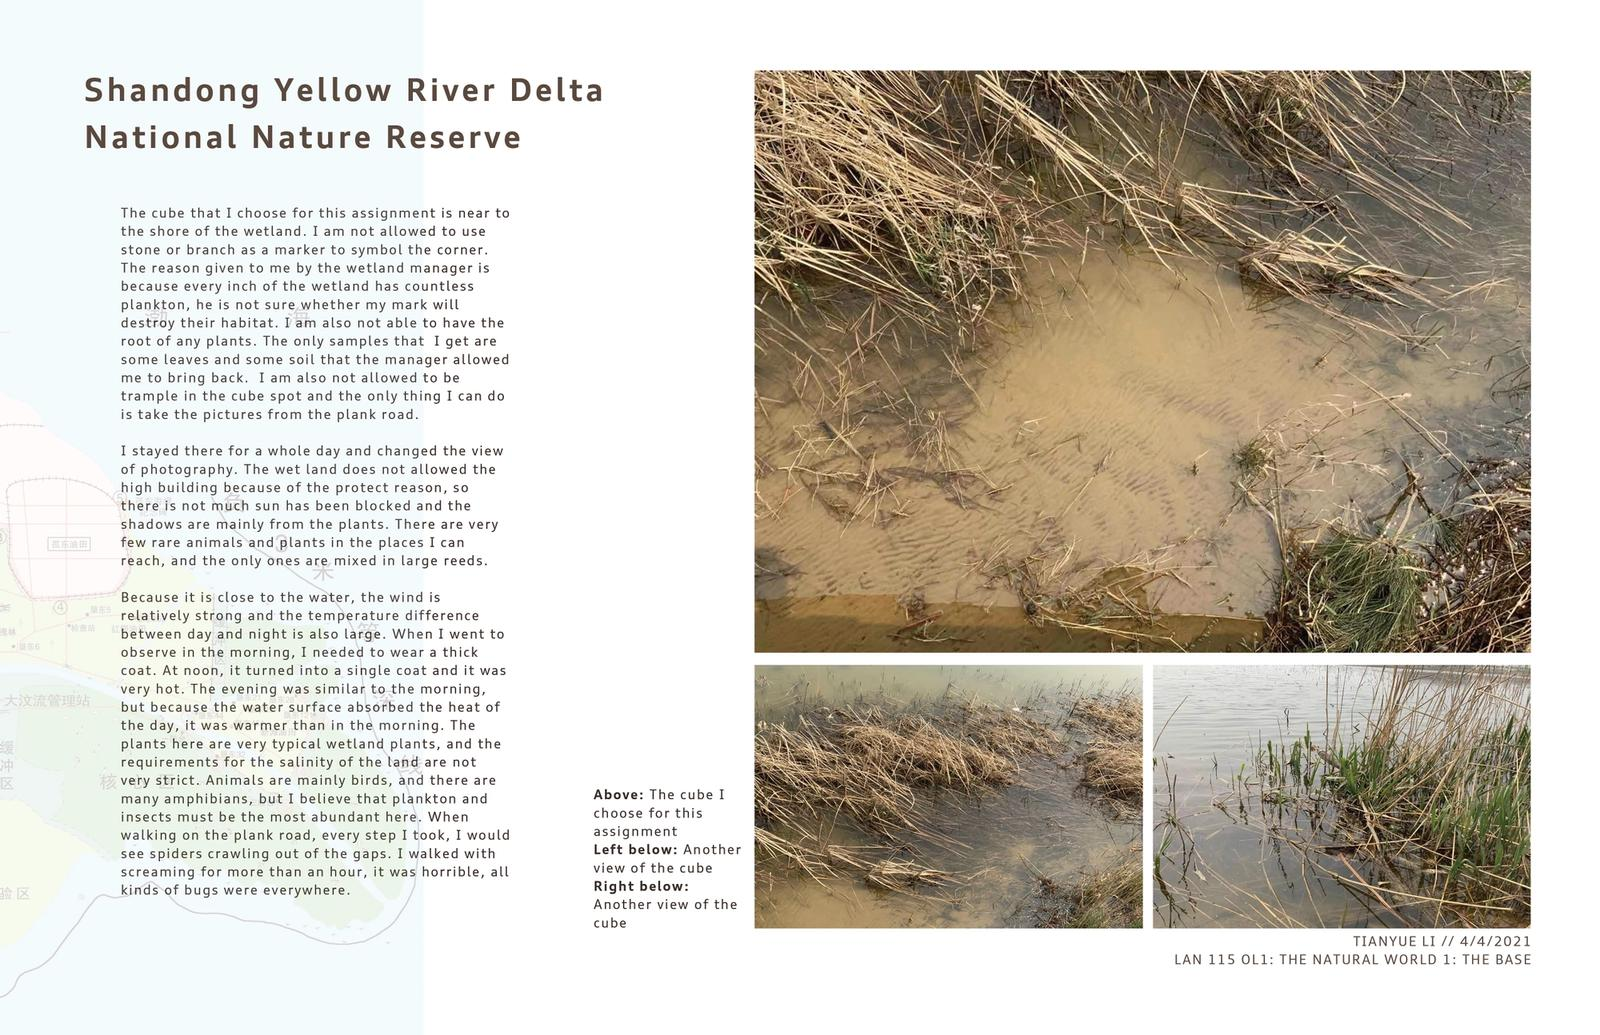 Shandong Yellow River Delta National Nature Reserve 3